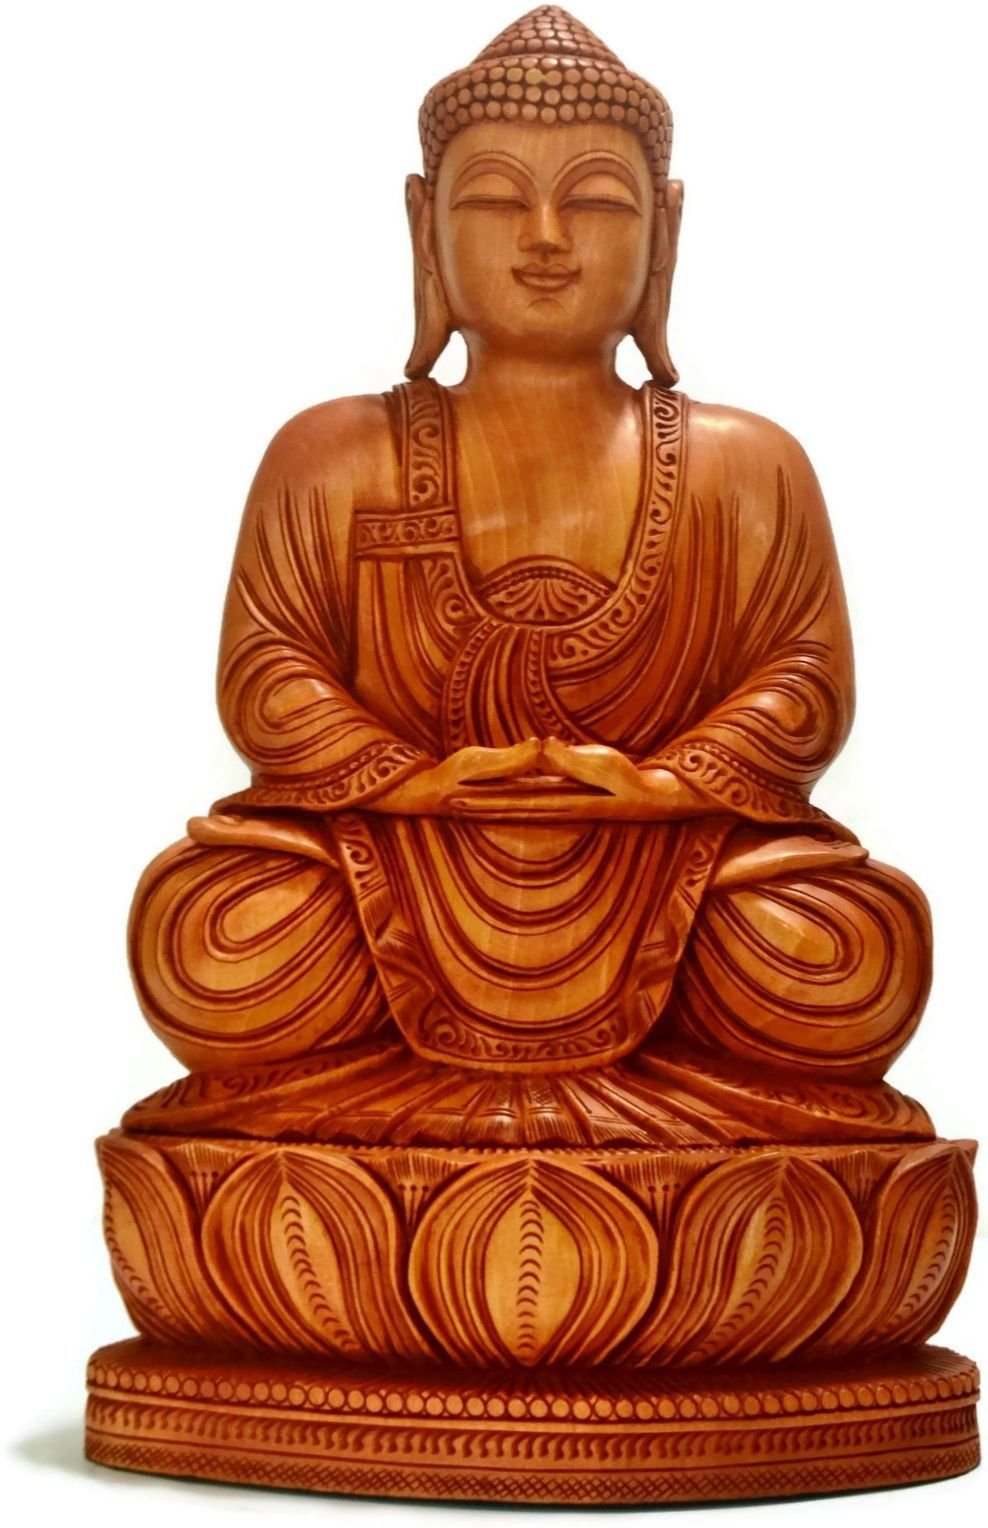 CraftVatika 15 inch Wooden Meditating Buddha Statue- Large Tibet Tibetan Chinese Hand Carved Samadhi Buddhist Sculpture CraftVatika by CraftVatika